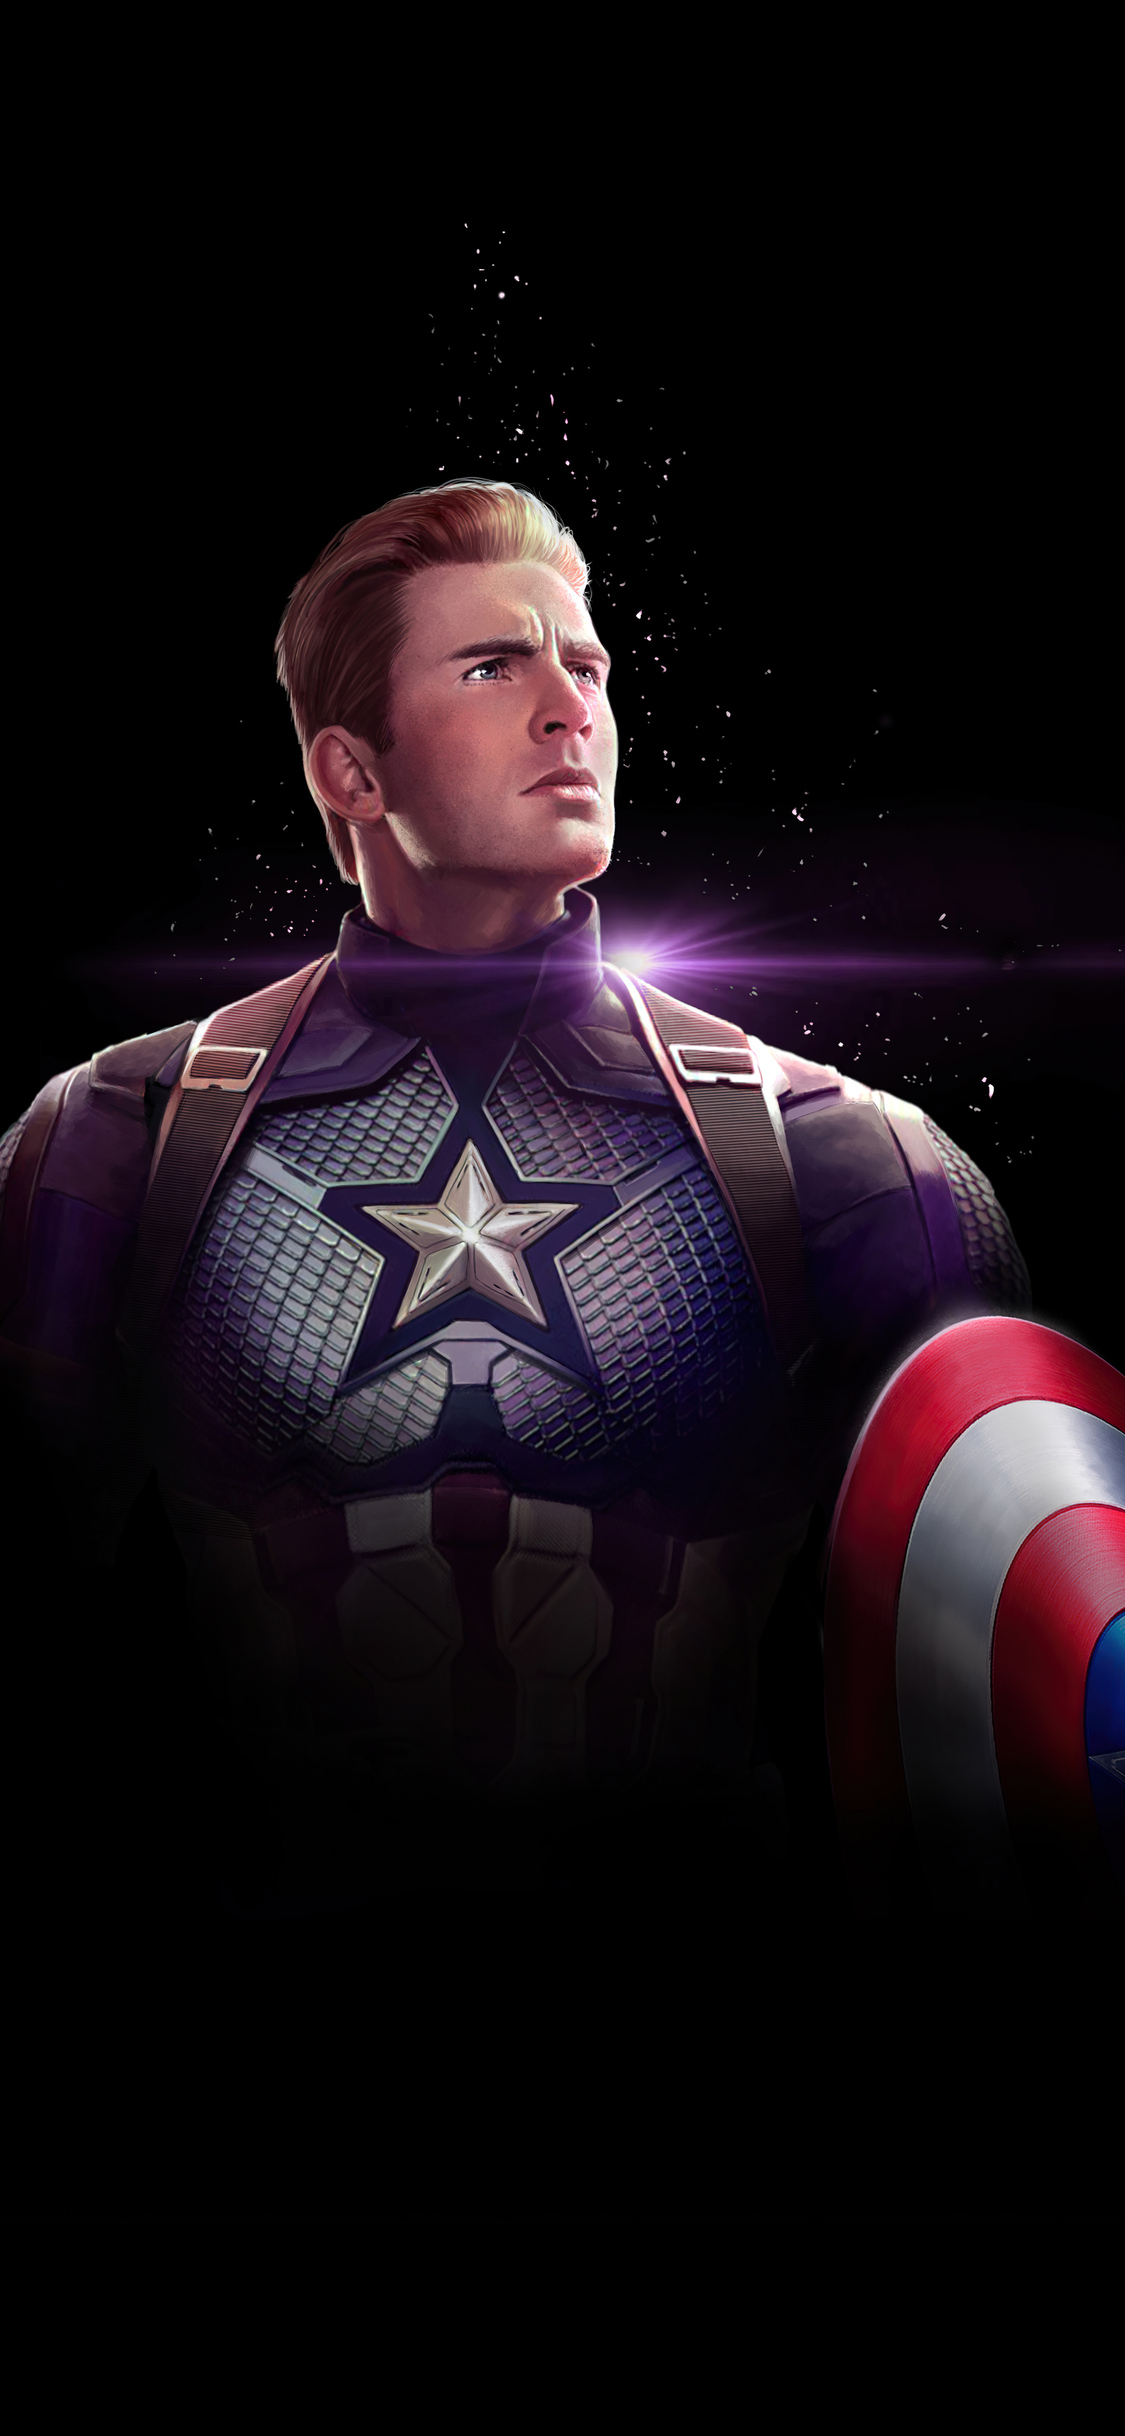 captain-america-dark-4k-fl.jpg